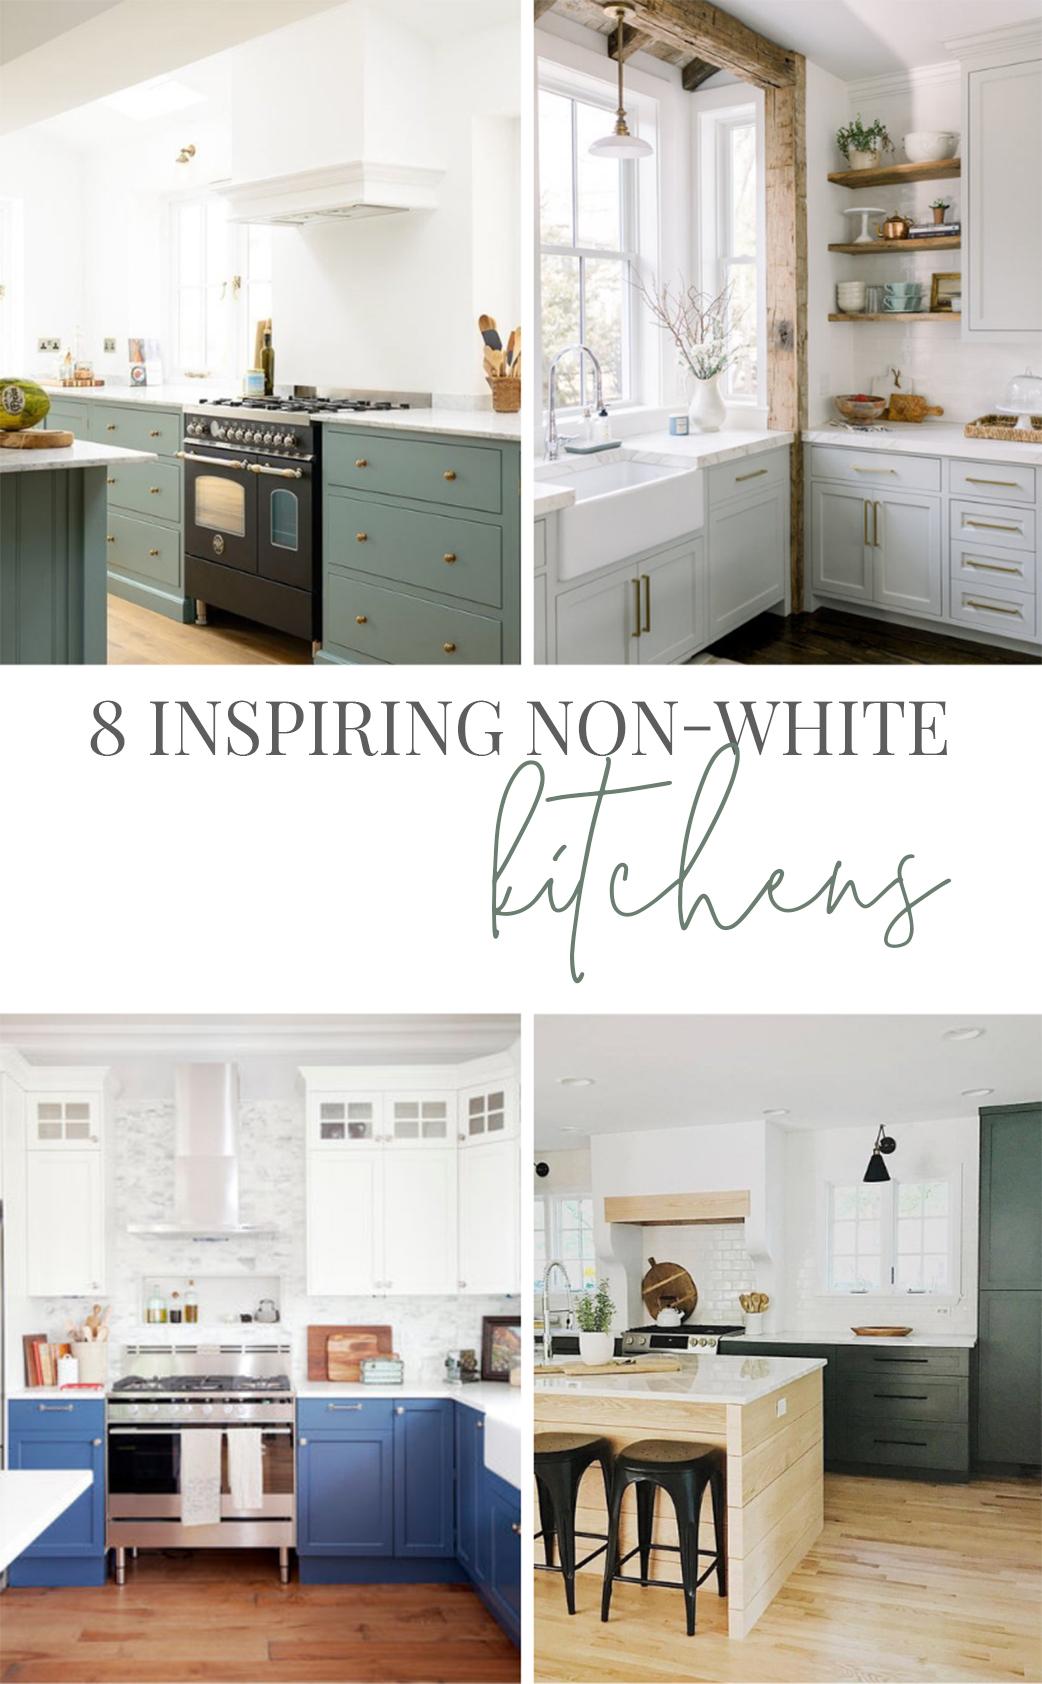 8 Inspiring Non-White Kitchens.jpg